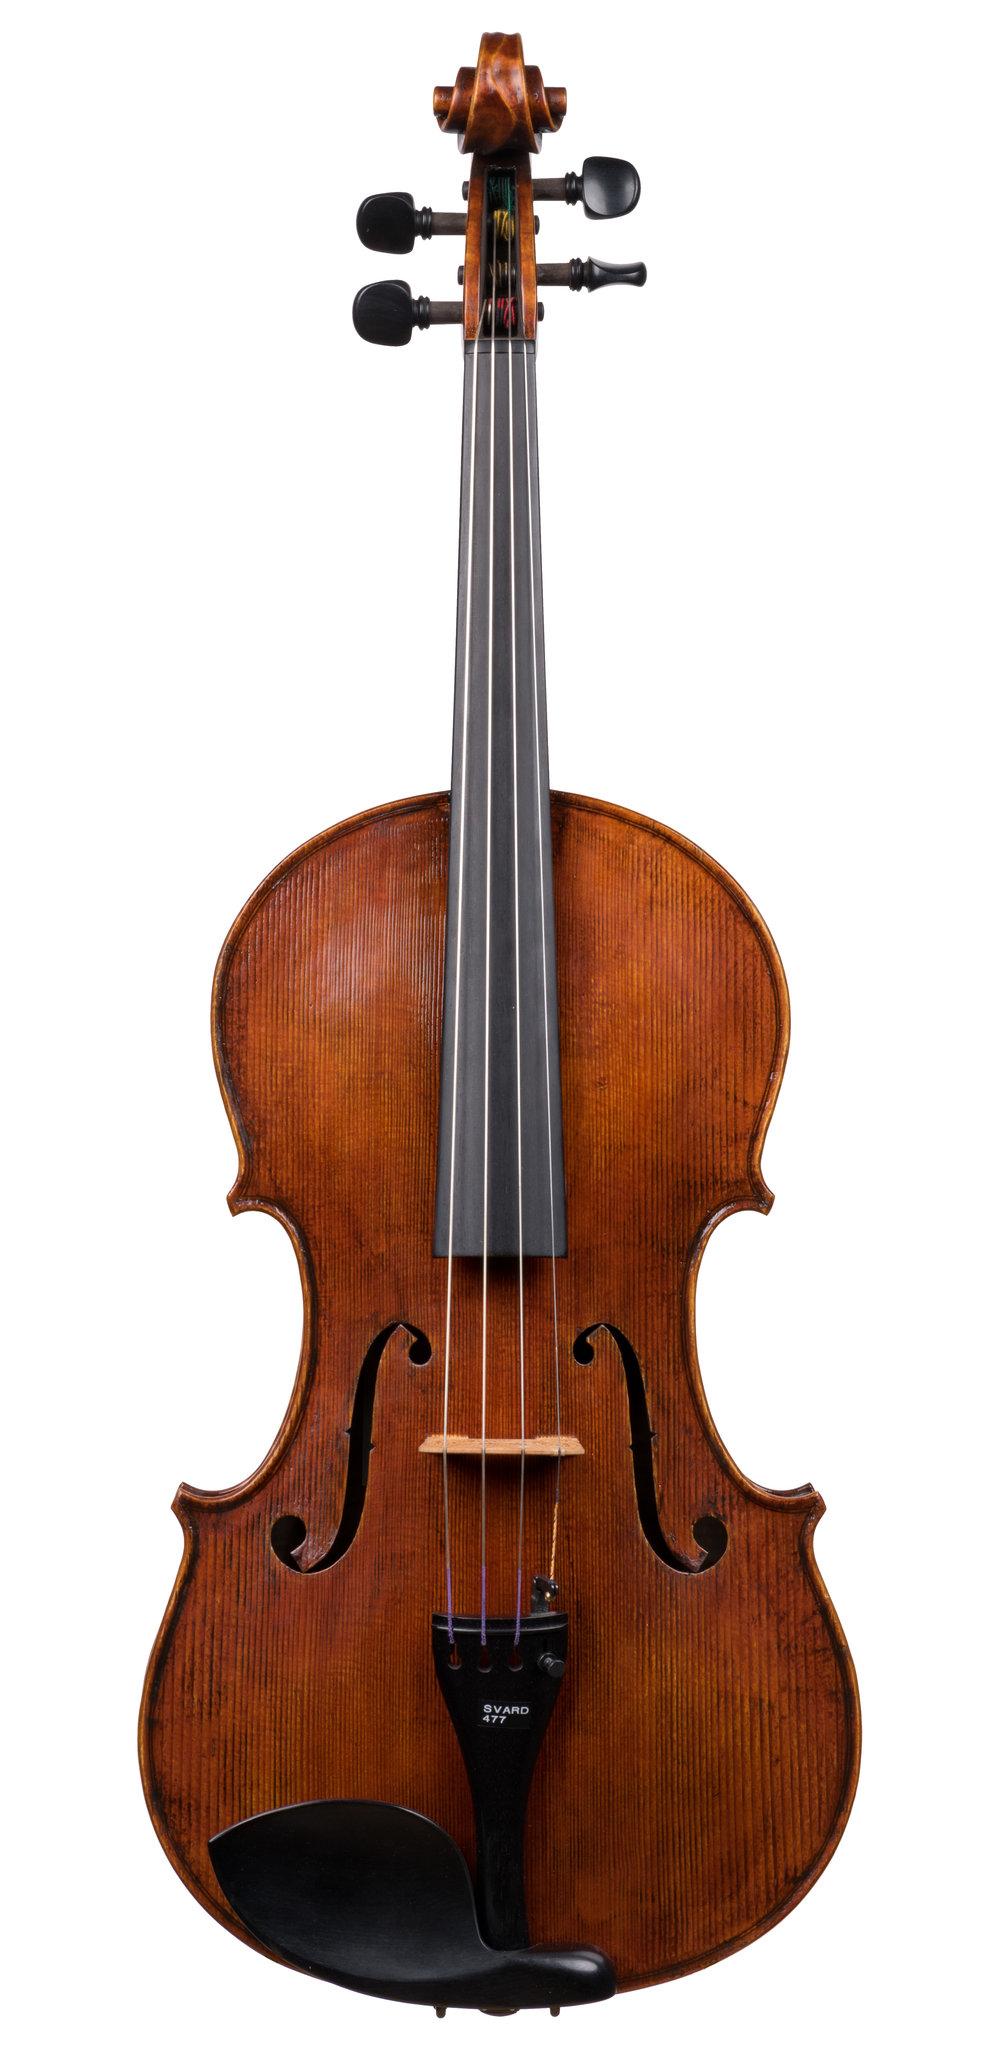 Kristin A. Siegfried viola, Chicago, 2014, 16